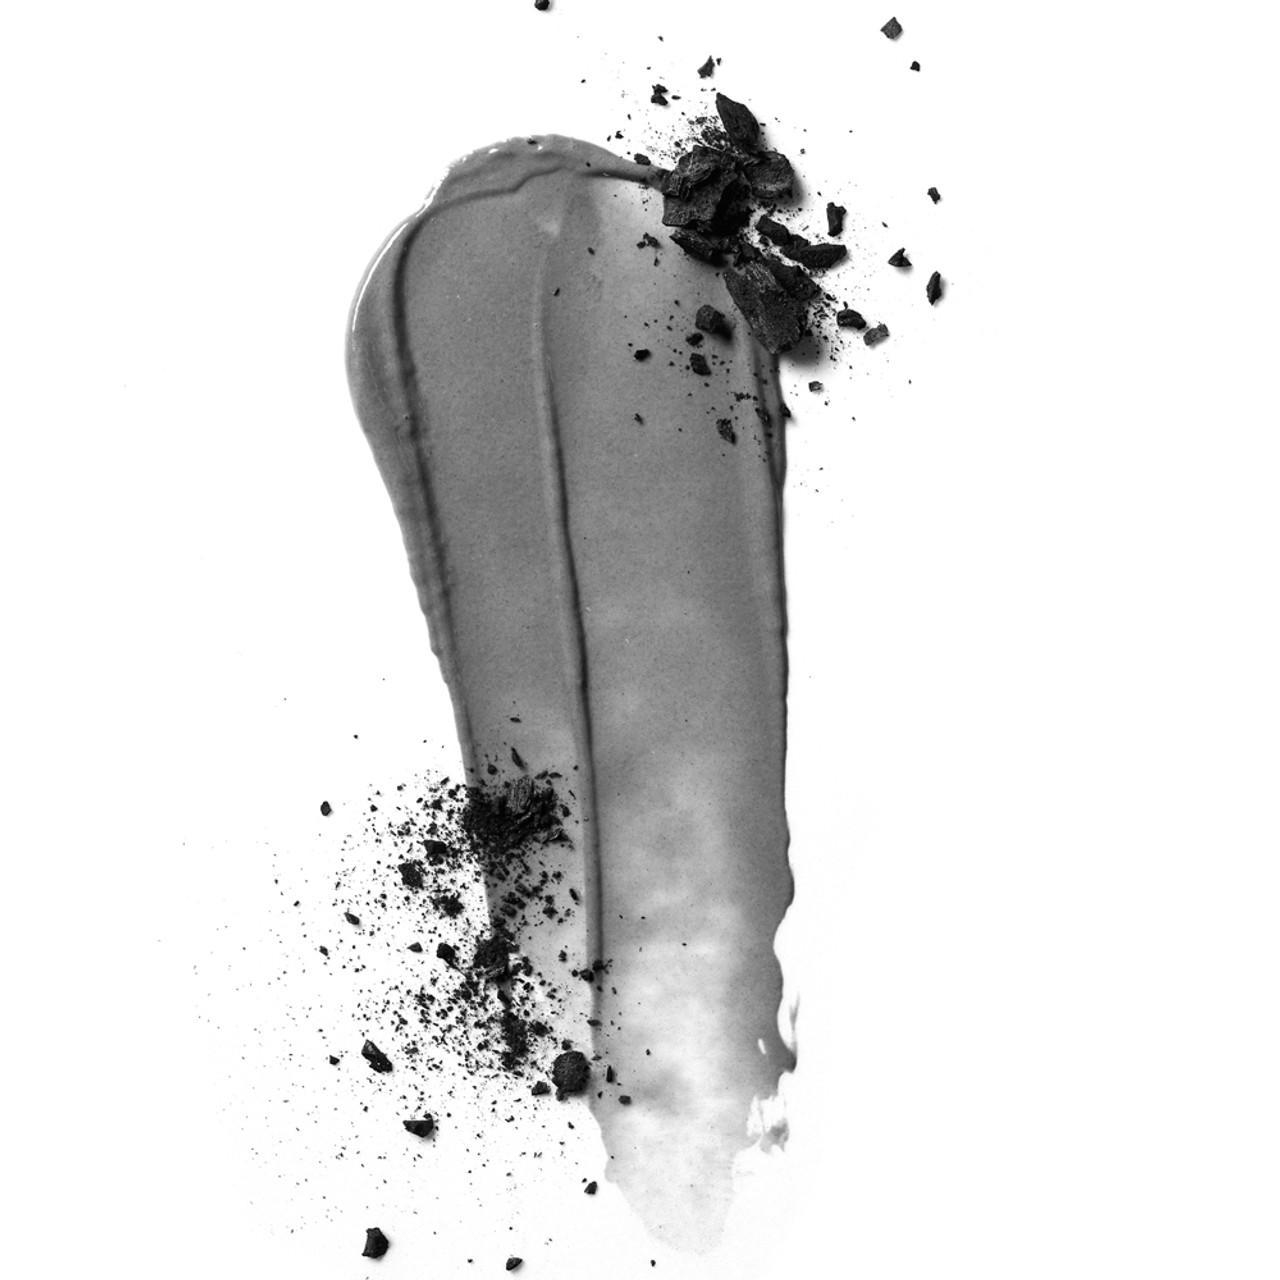 Dermalogica Active Clay Prebiotic Cleanser